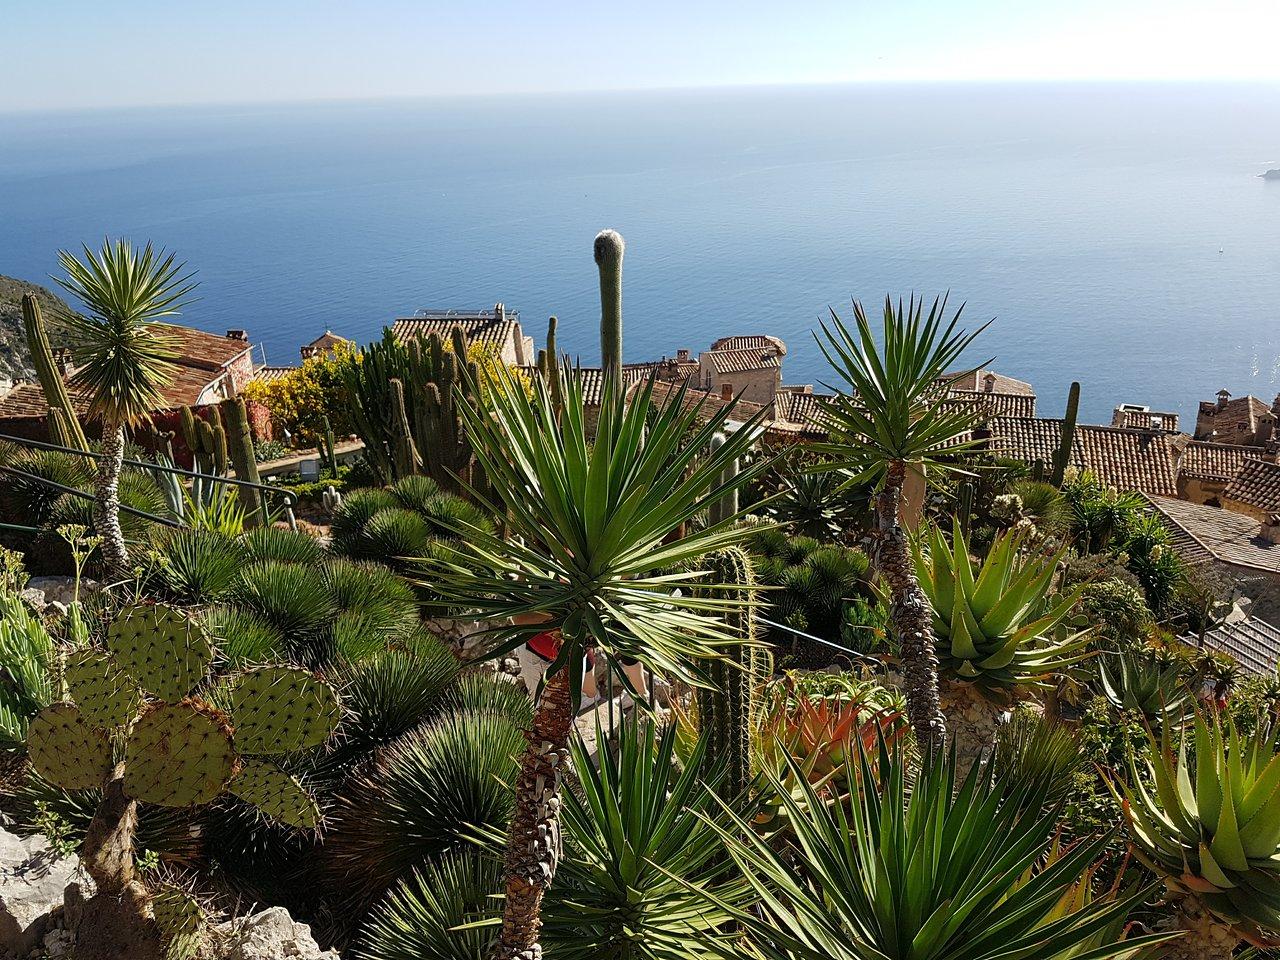 1139-jardin-exotique-eze-alpes-maritimes.jpg